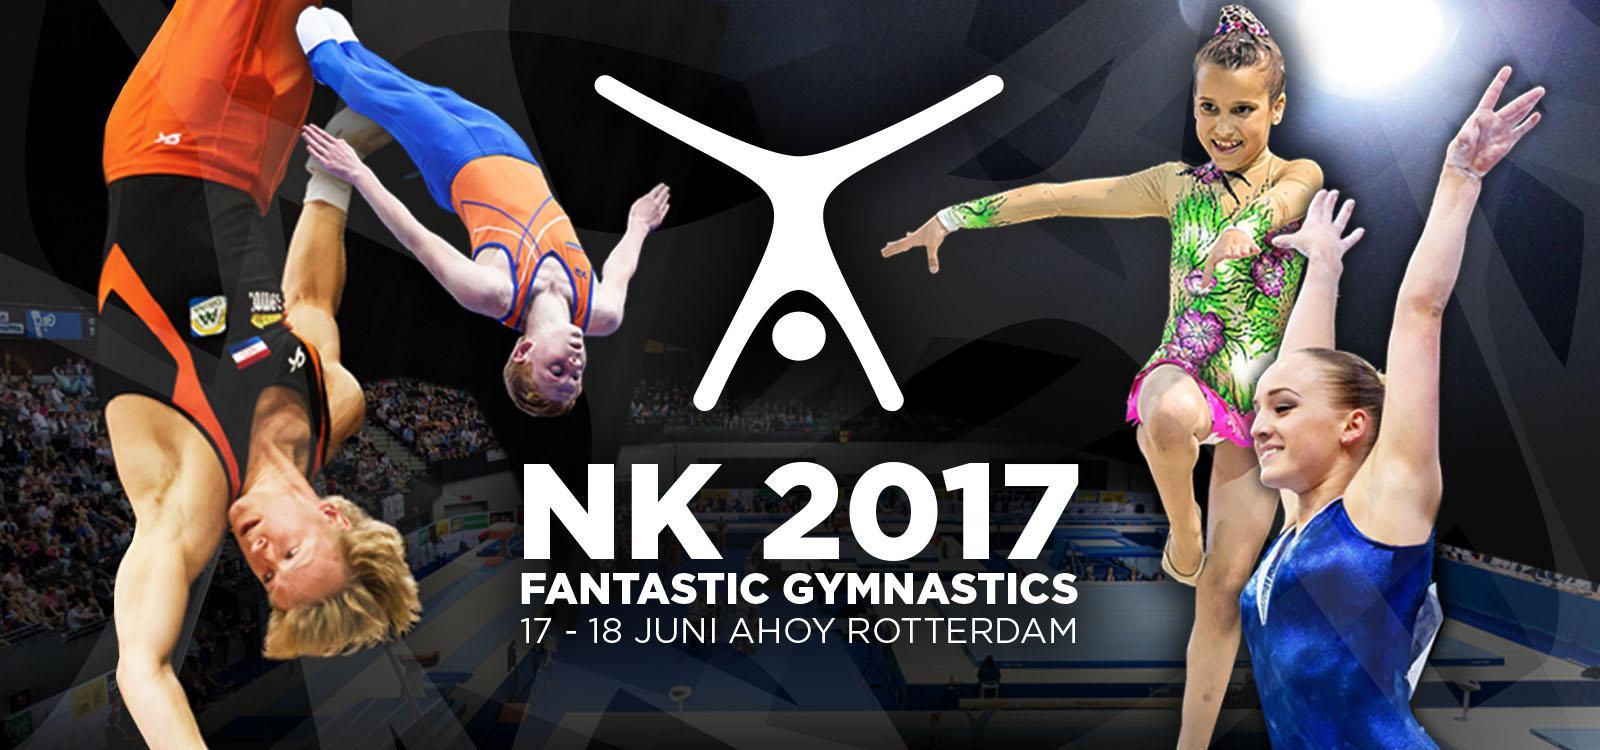 fantastic gymnastics. fantastic gymnastics